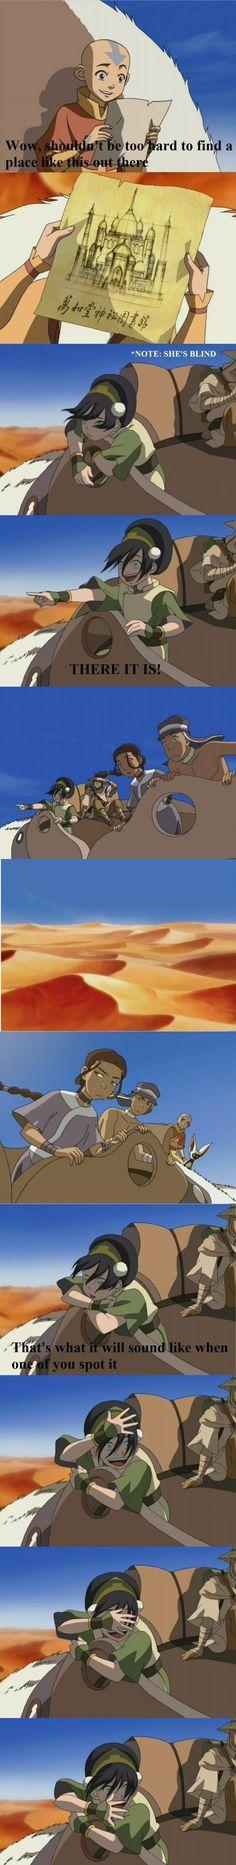 Avatar: The Last Airbender - Aang, Sokka Katara ,Toph , and Toph's blind but funny Korra Avatar, Team Avatar, Legend Of Aang, The Familiar Of Zero, Got Anime, Culture Art, Troll, Sneak Attack, Avatar Funny